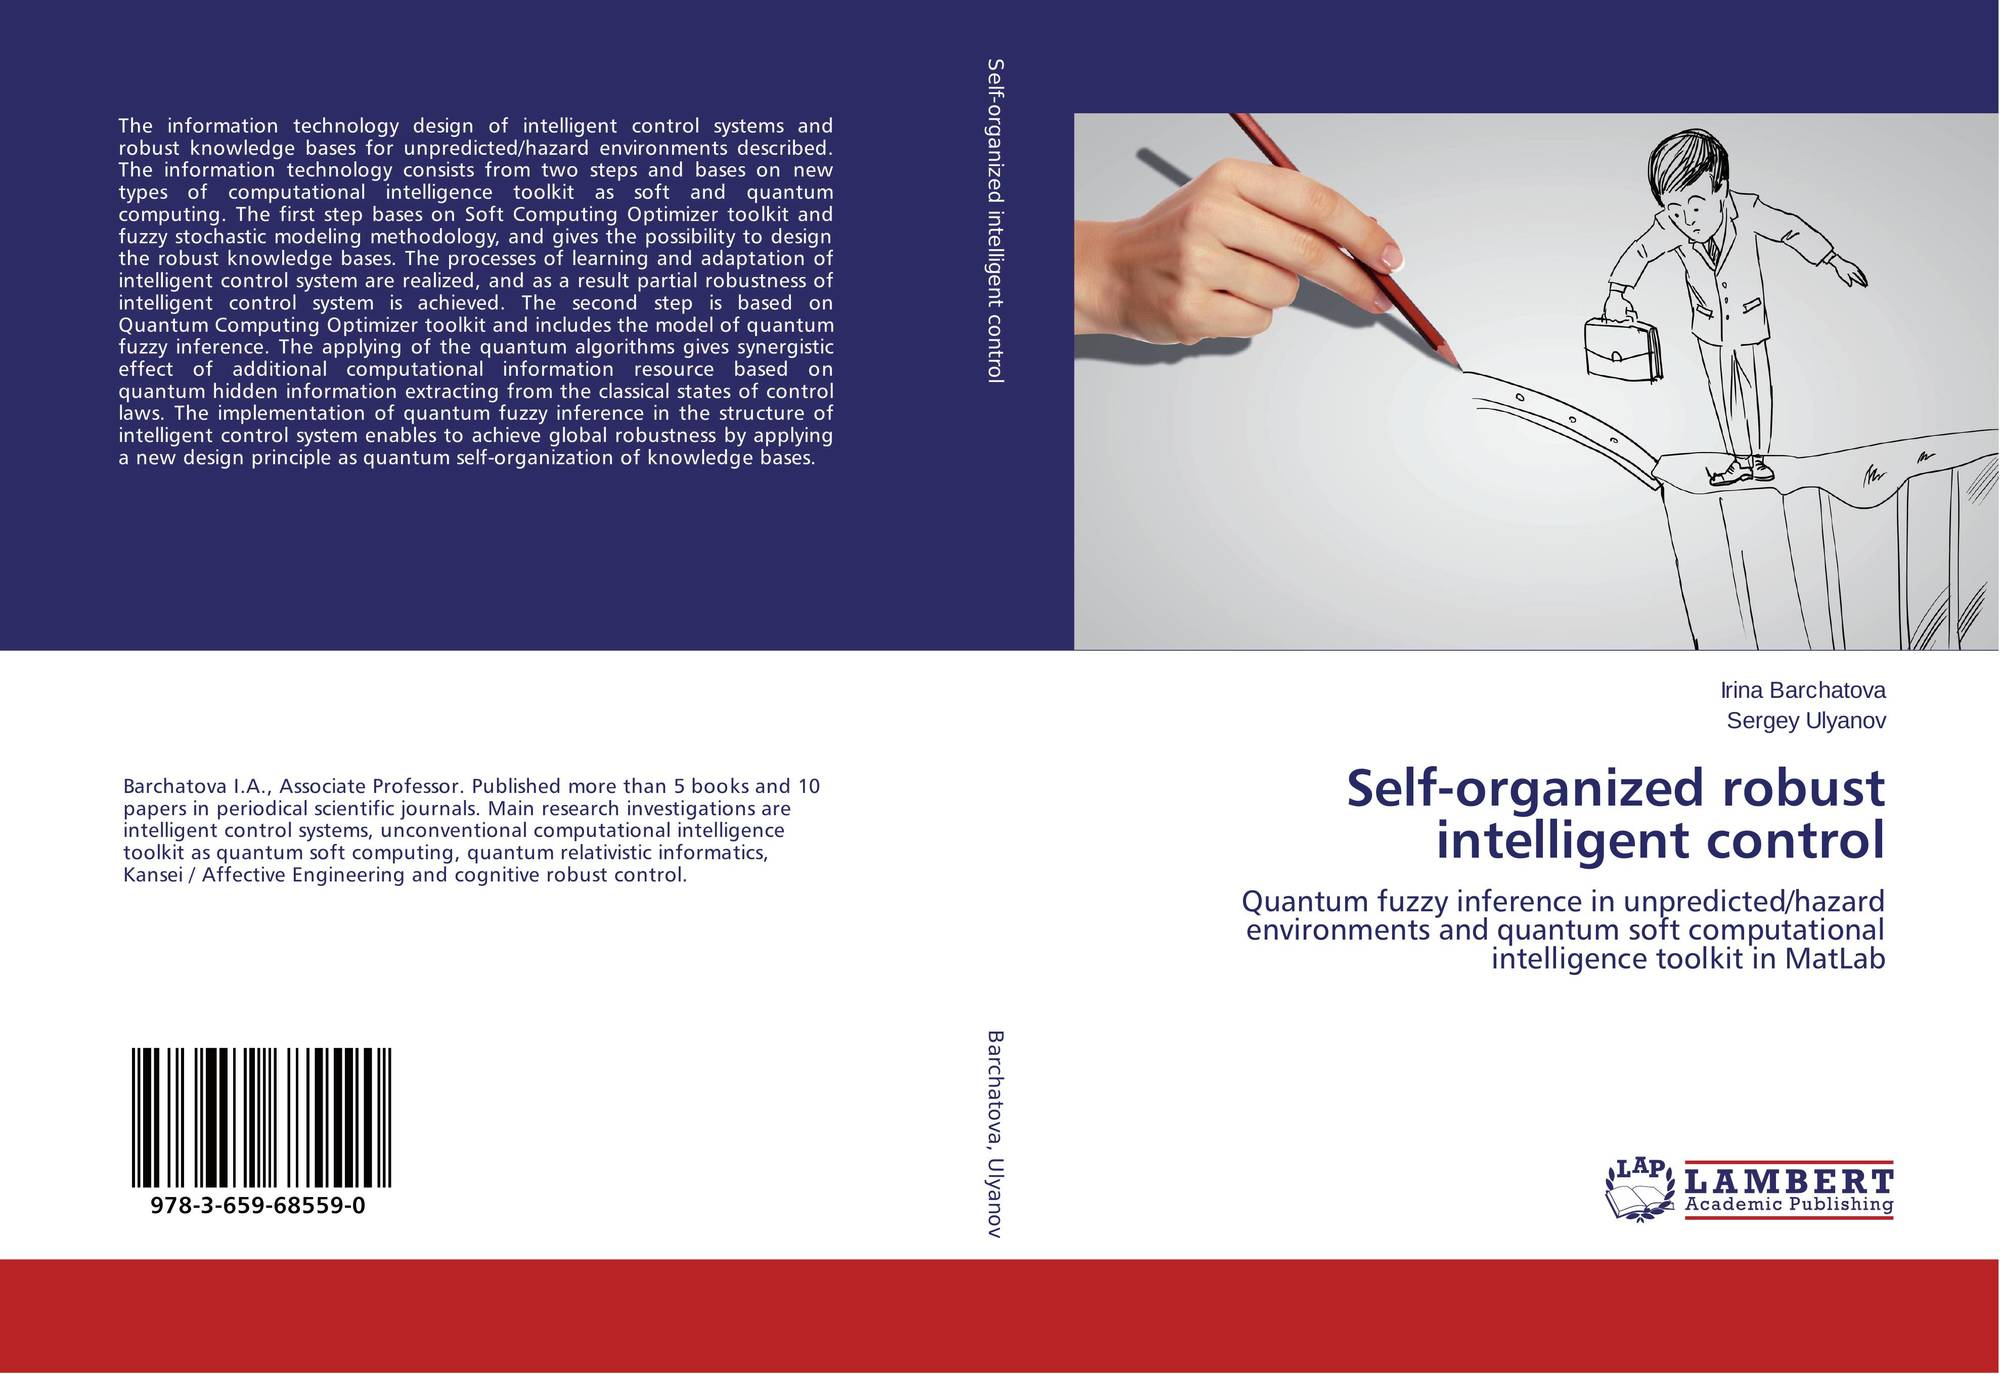 Self-organized robust intelligent control, 978-3-659-68559-0